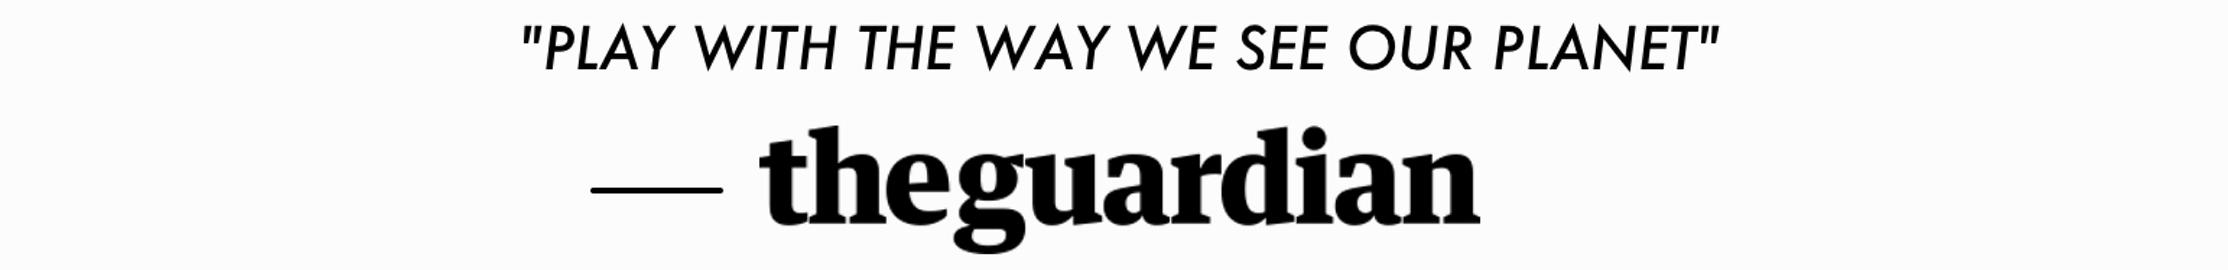 THE+GUARDIAN+2+big.jpg